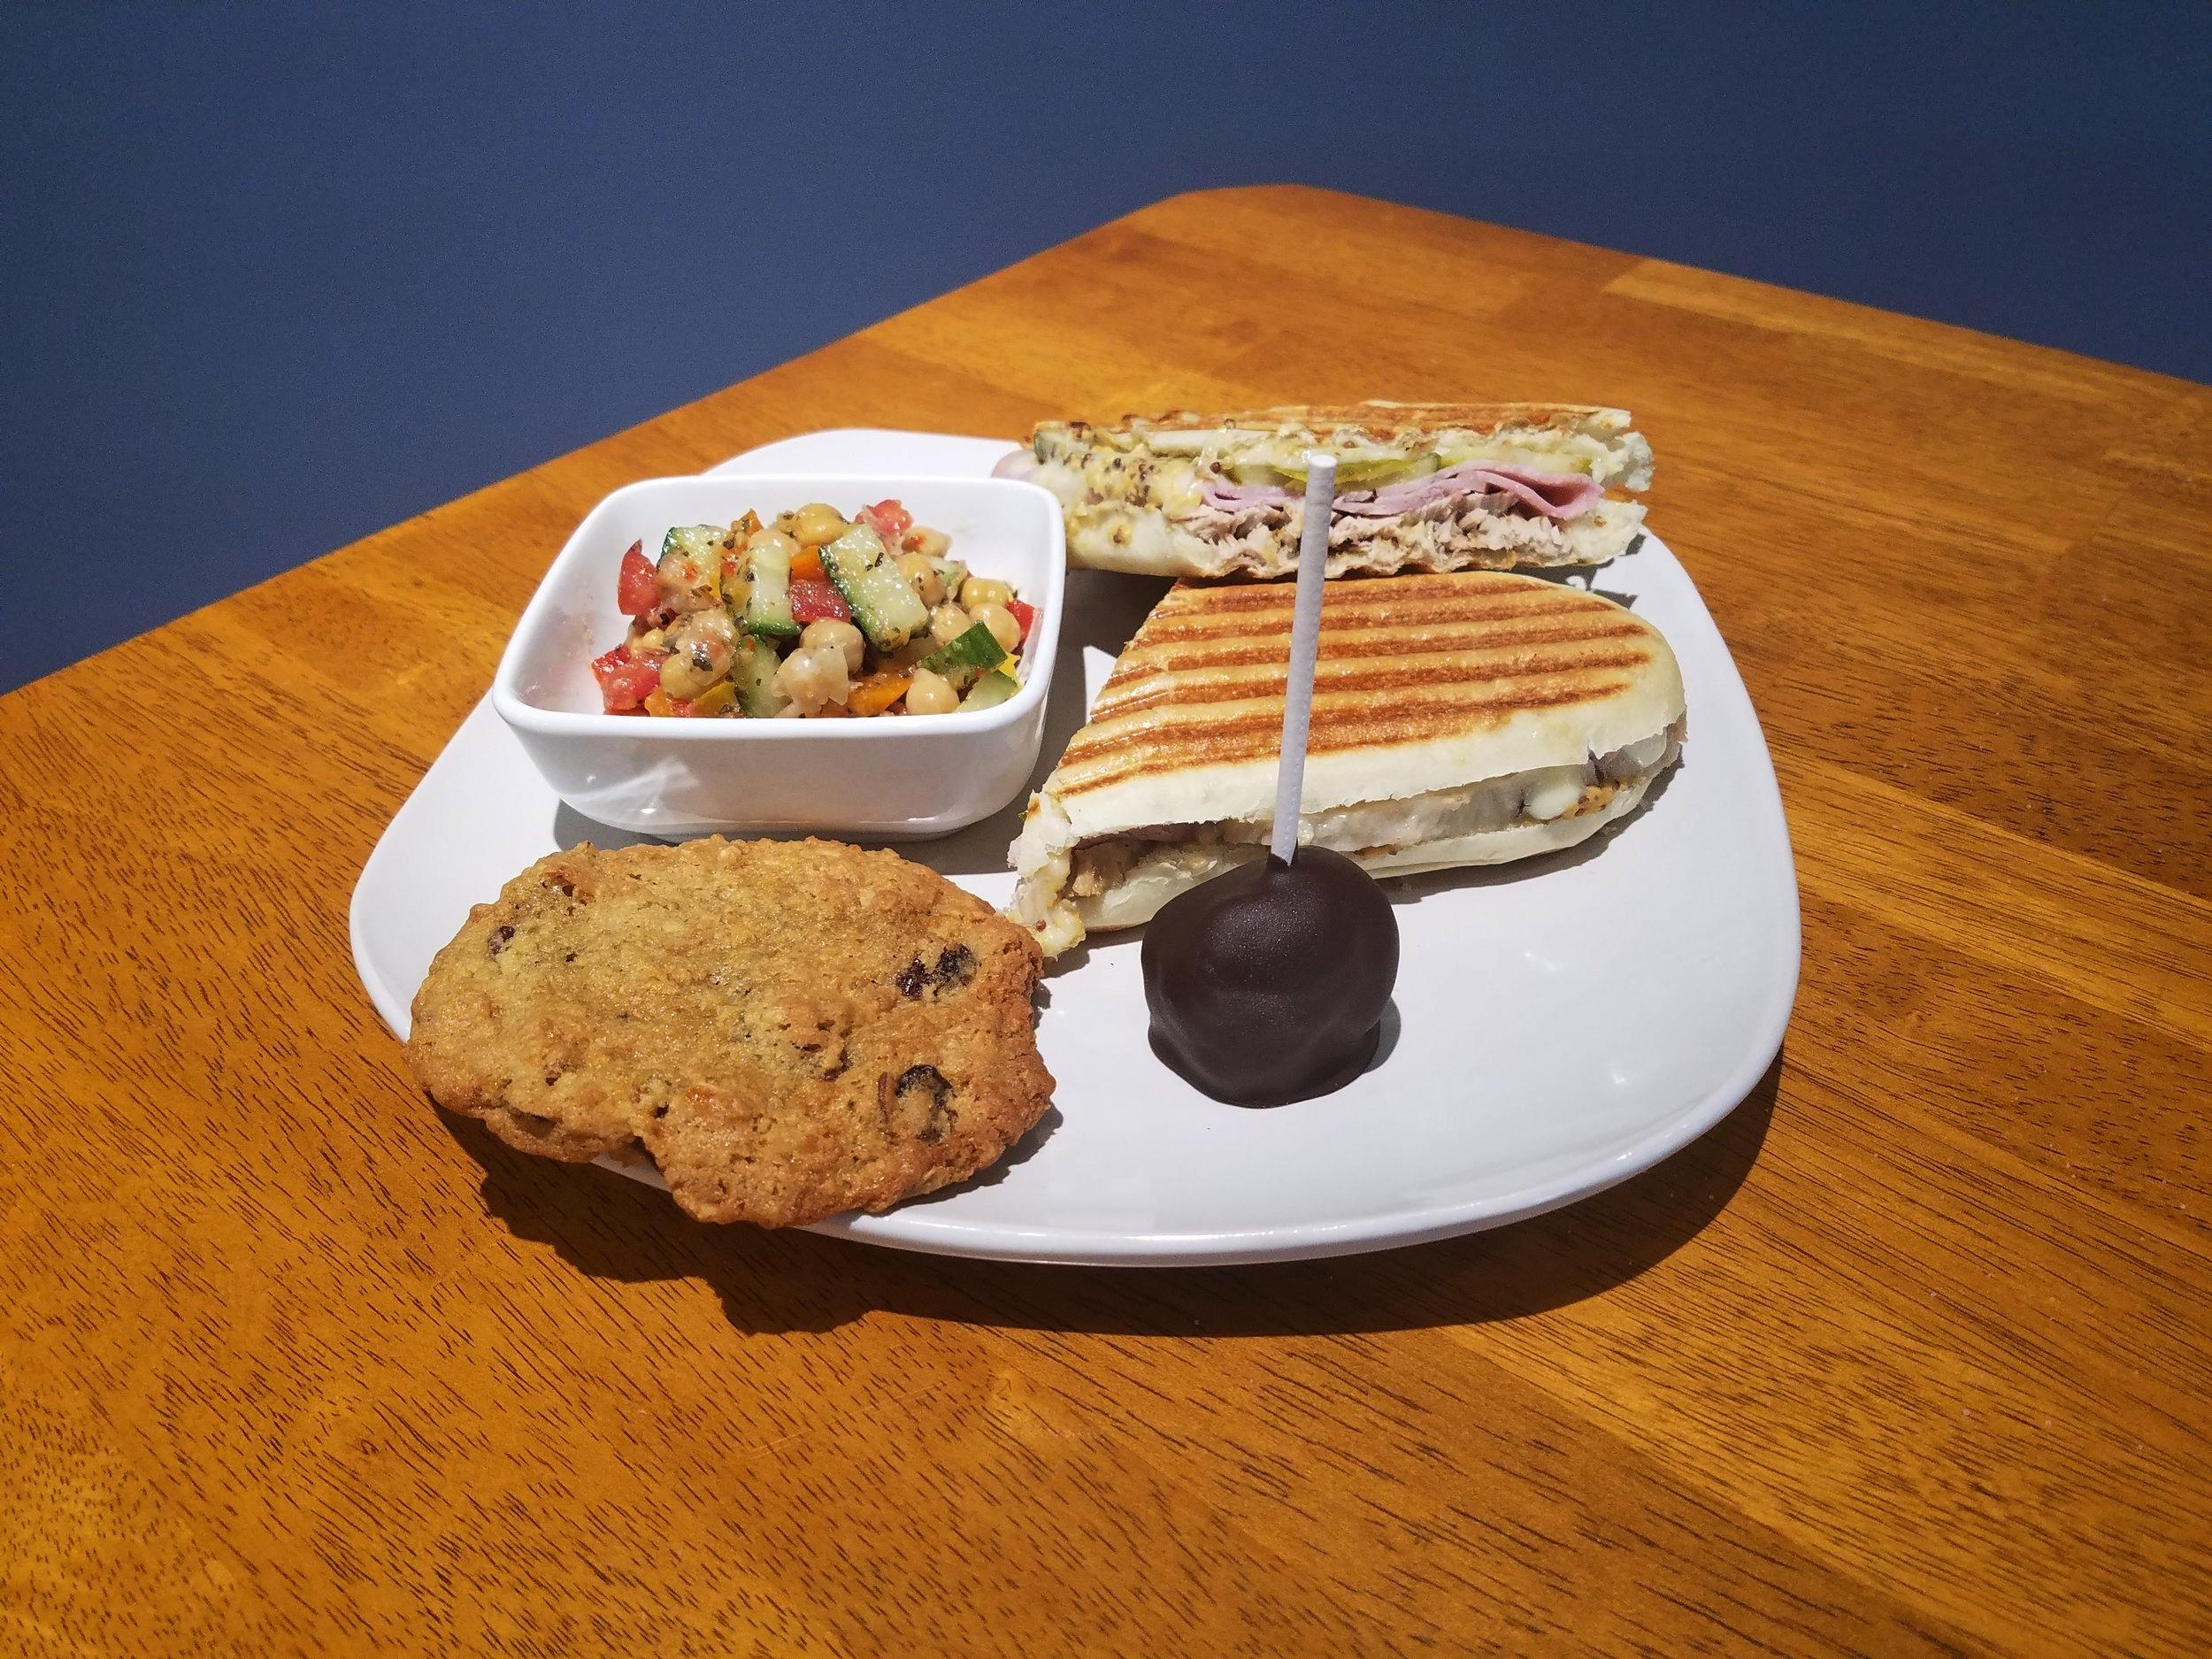 Cuban Sandwich, Deli salad, Cookies, Cheese Cake Pop